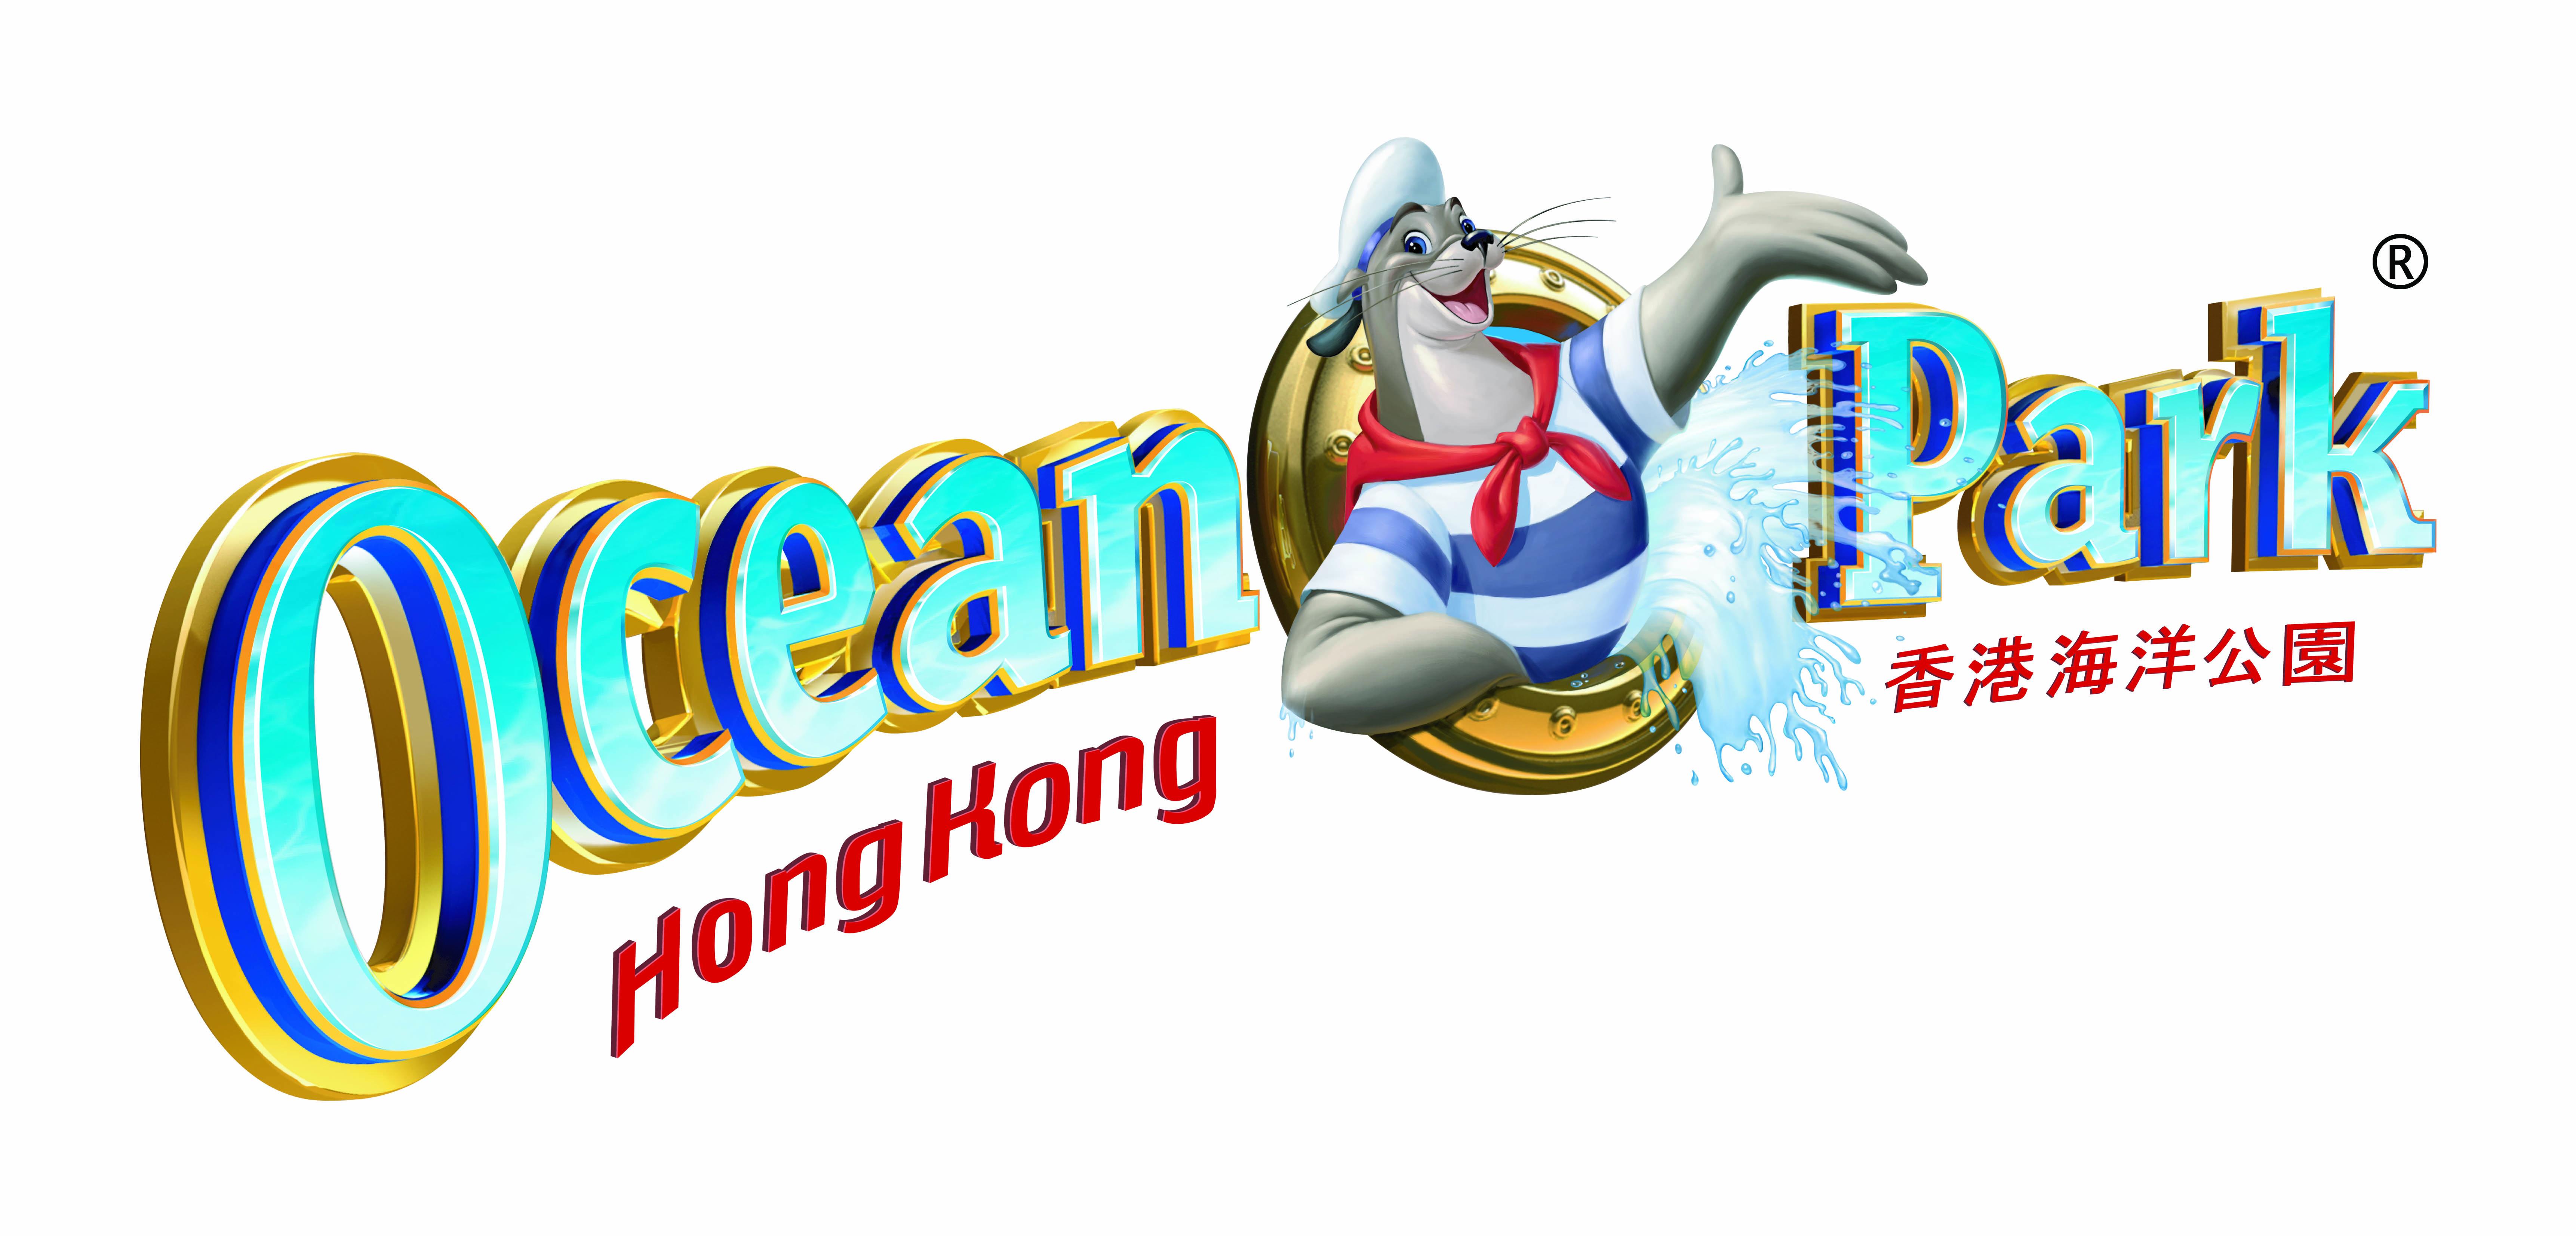 Ocean park logo clipart png library Ocean Park Hong Kong | TTGmice Planner png library